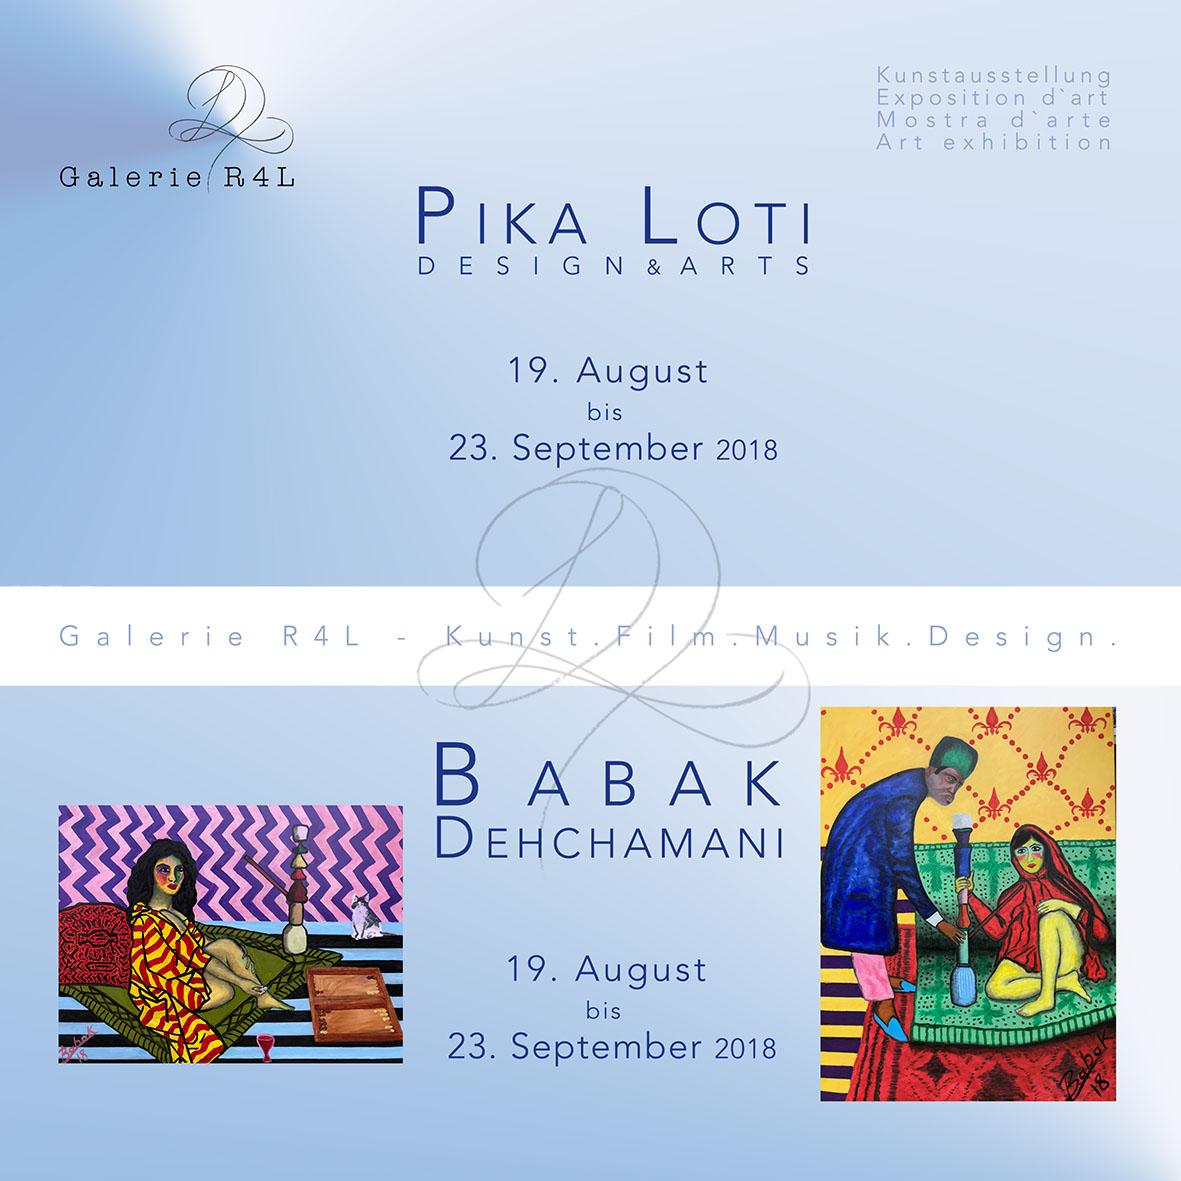 Kunstausstellung Pika Loti & Babak Dehchamani